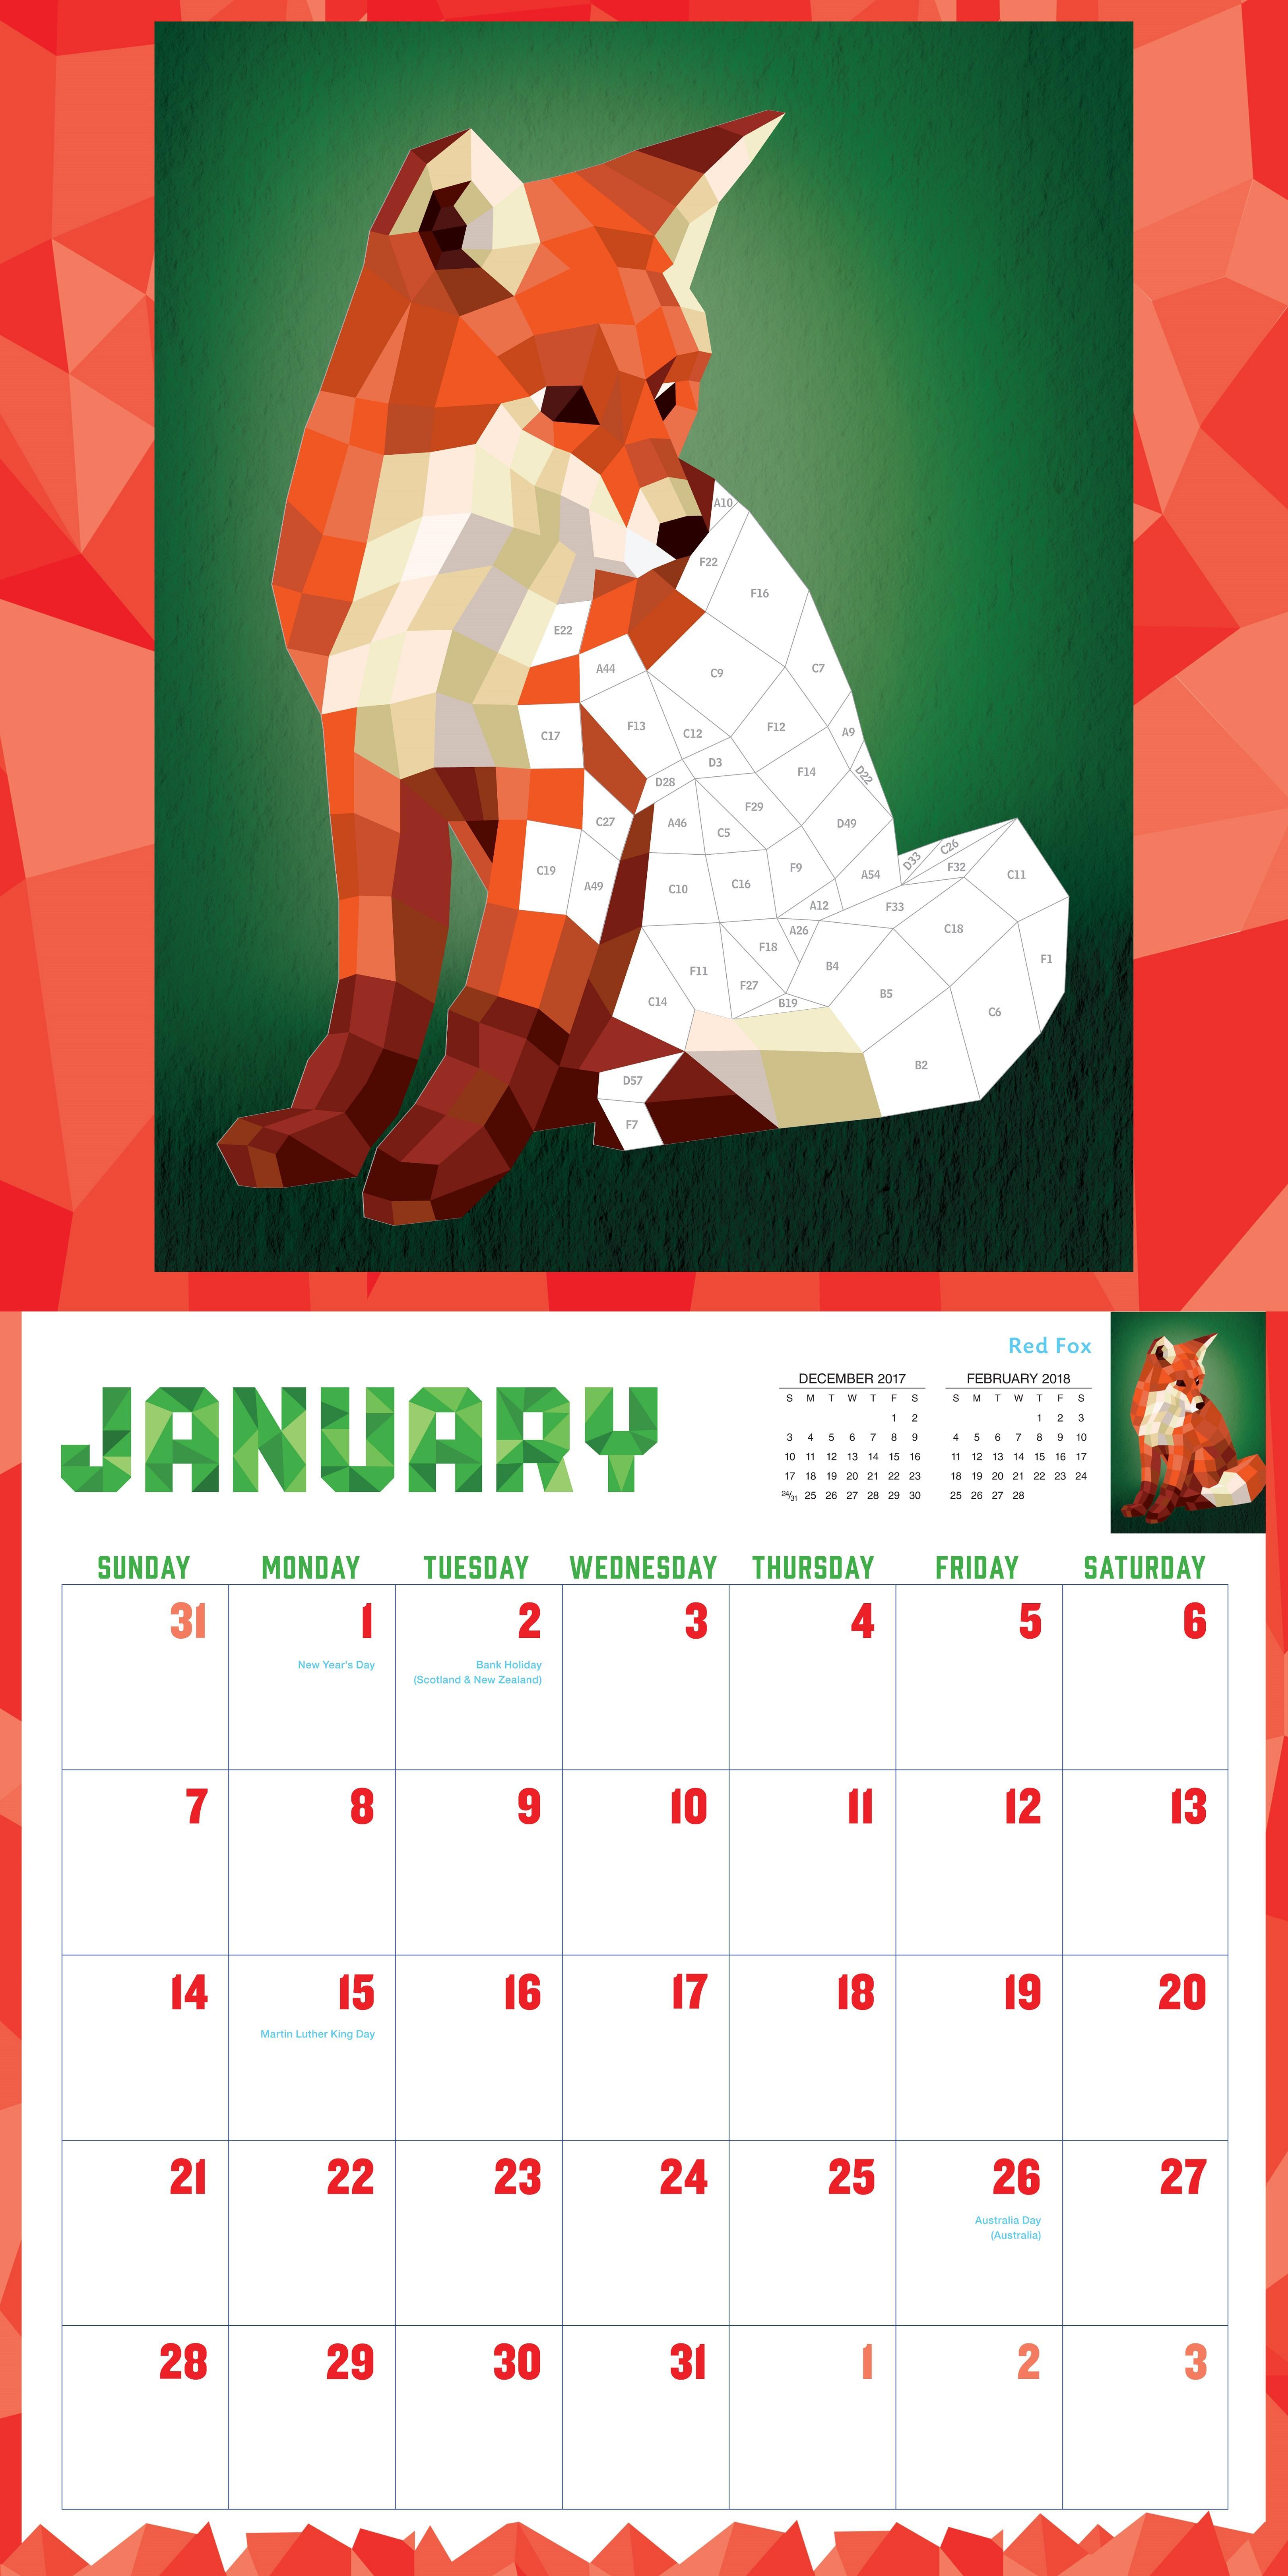 Amazon.com: Paint by Sticker Wall Calendar 2018 (9781523501786 ...